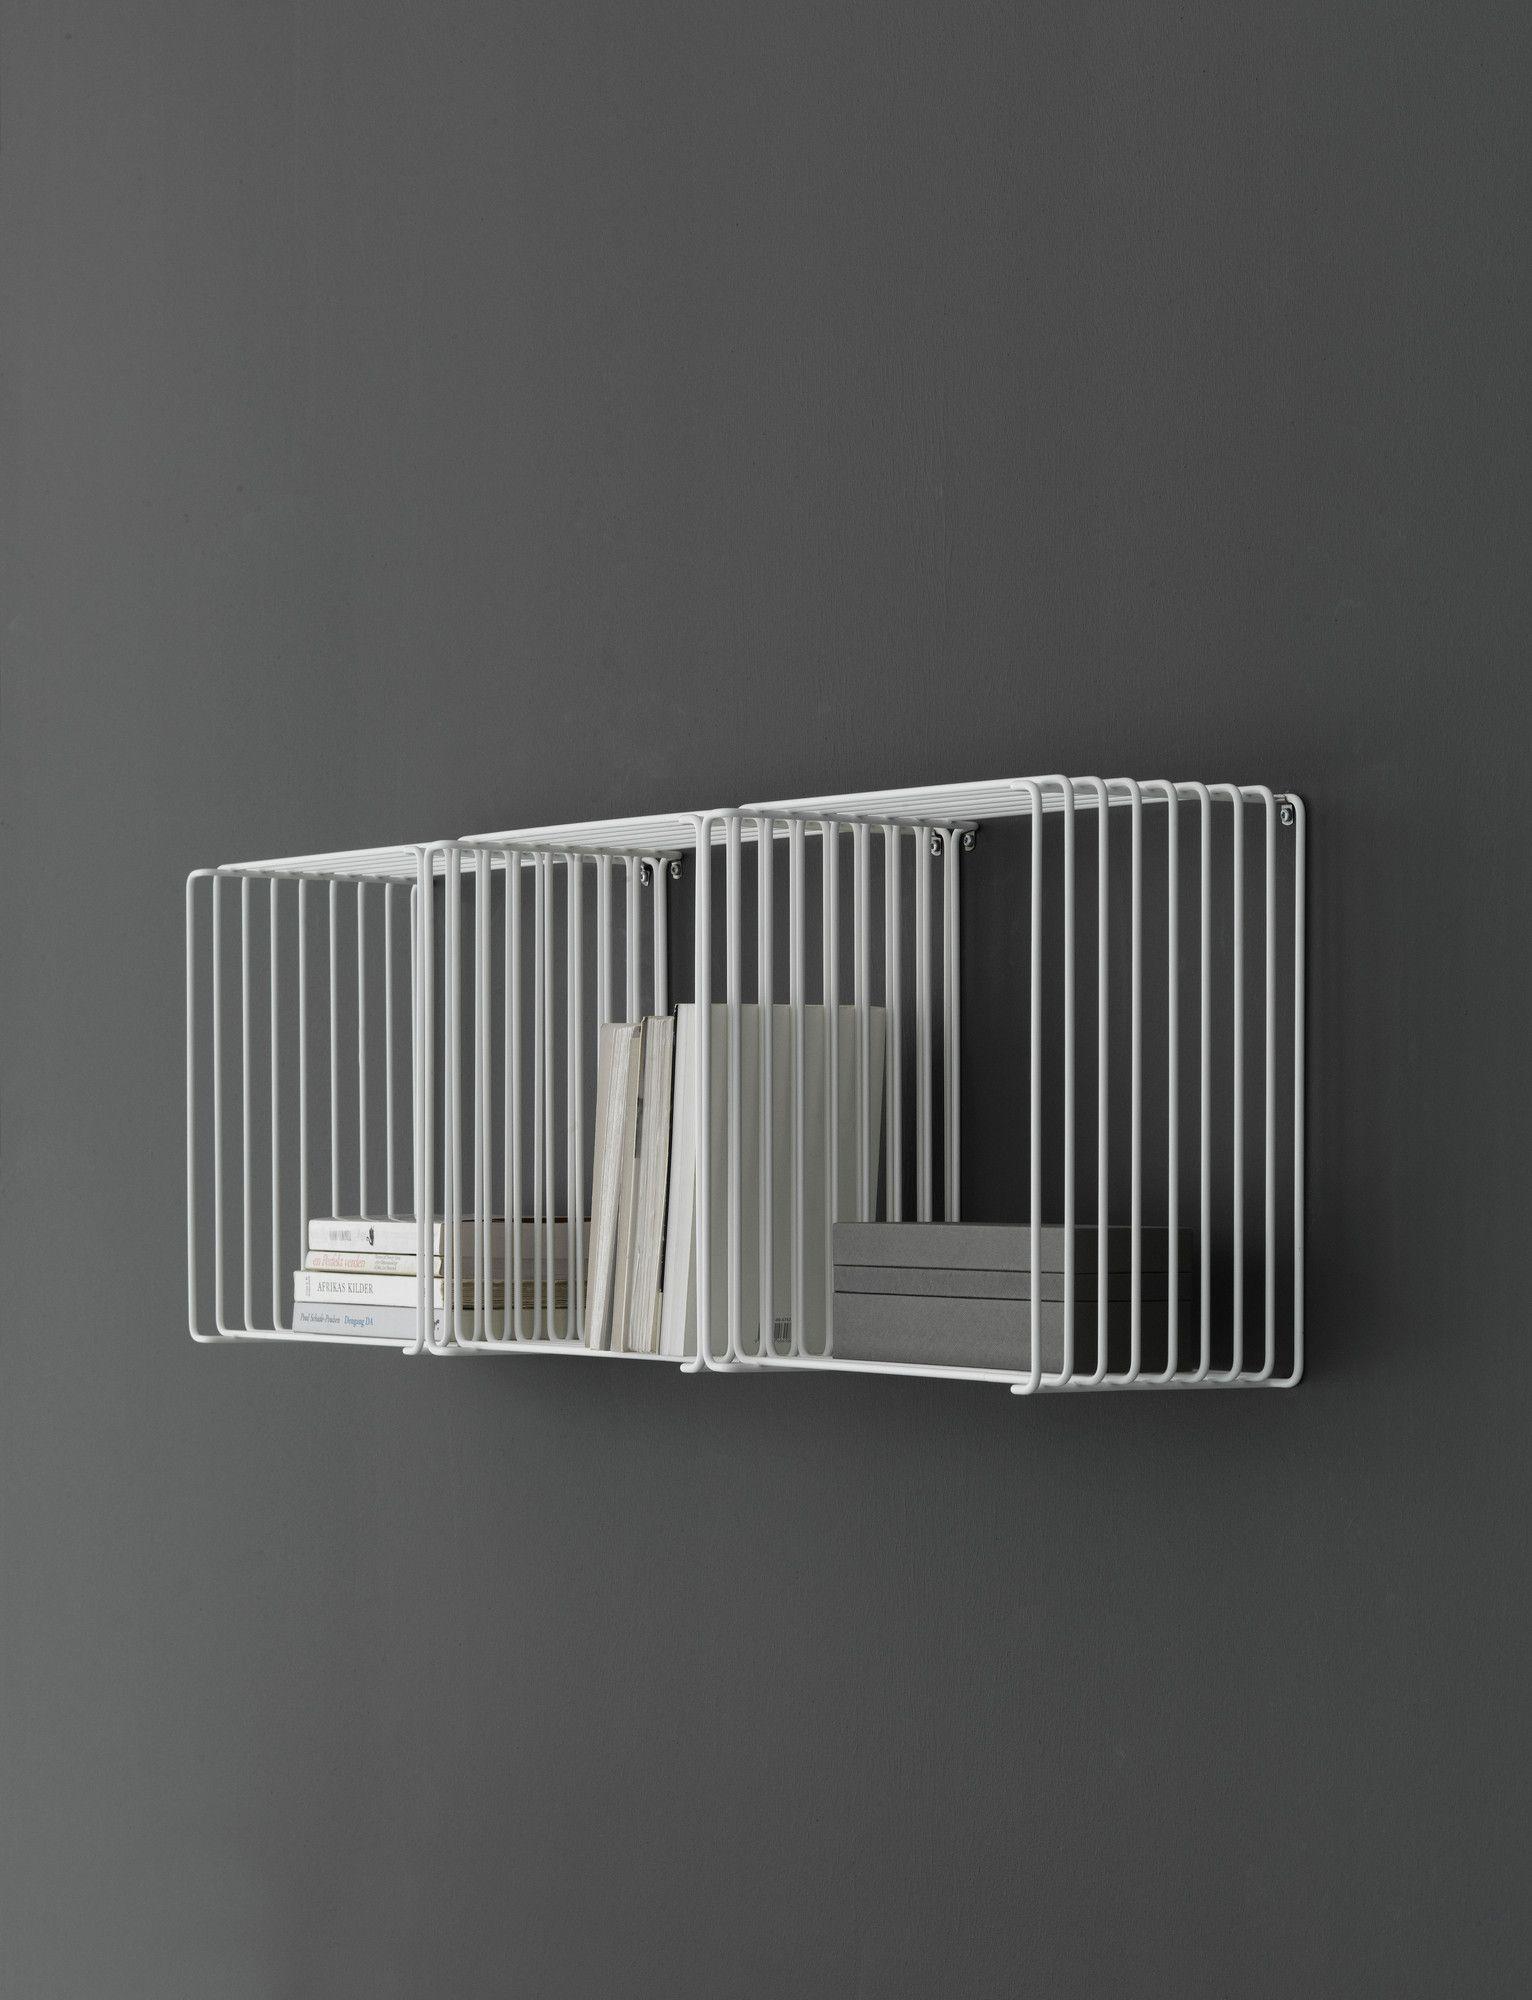 Panton Wire Cube Drahtregal 20 Cm Tief Montana Regal Einrichten Design Montana